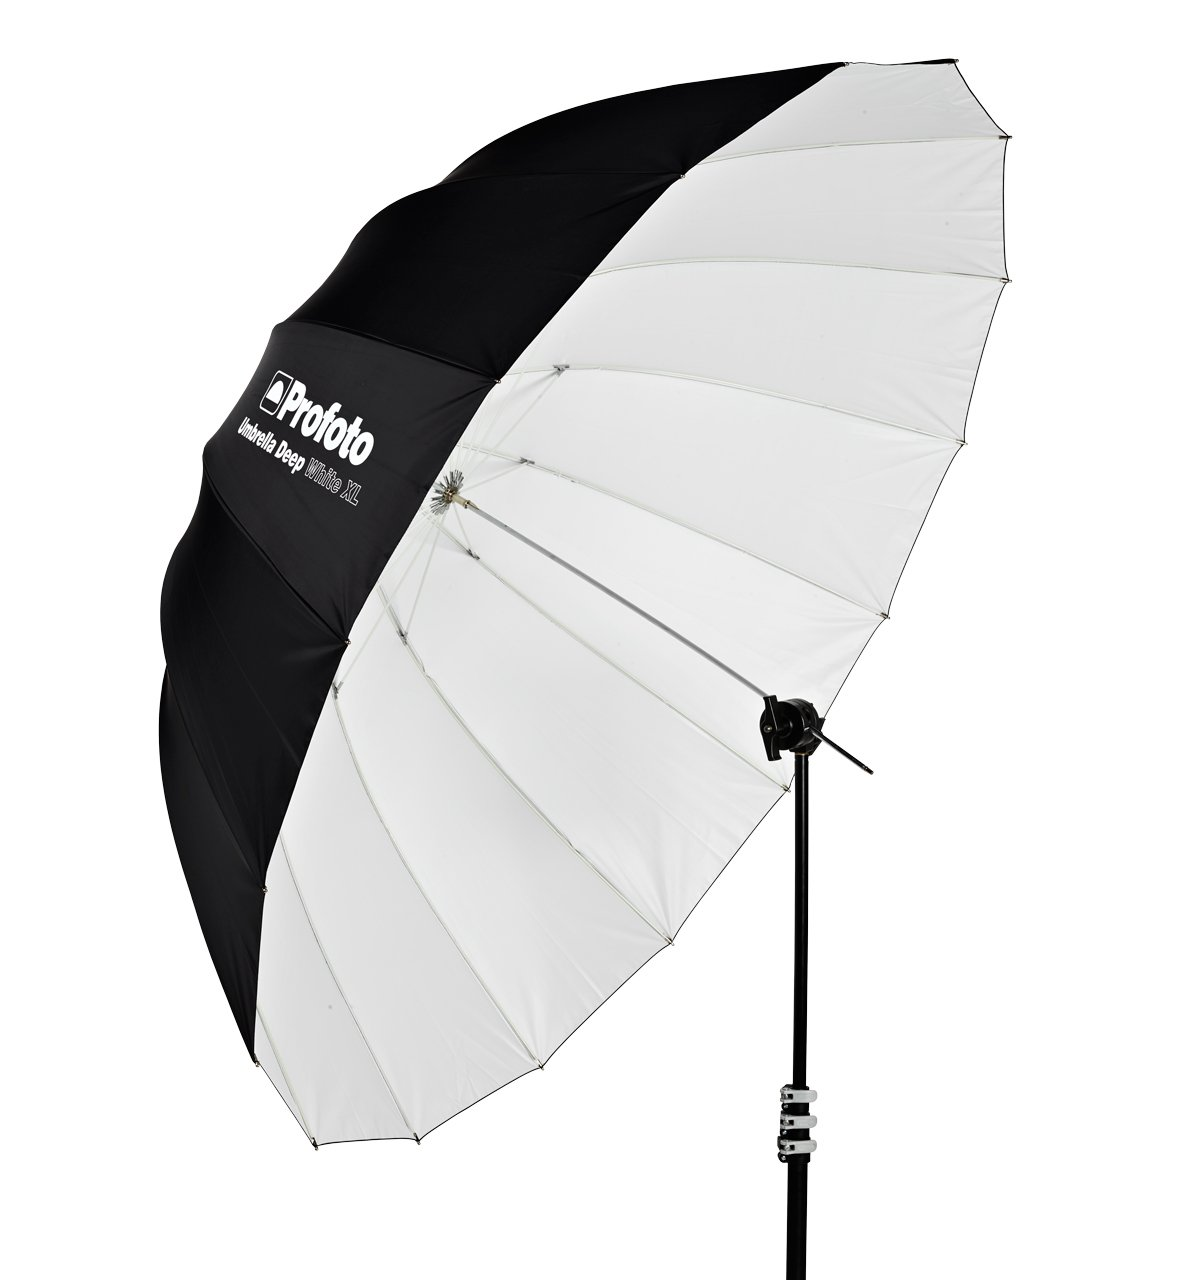 Profoto Deep Umbrella White - 65 Inch 100980 by Profoto